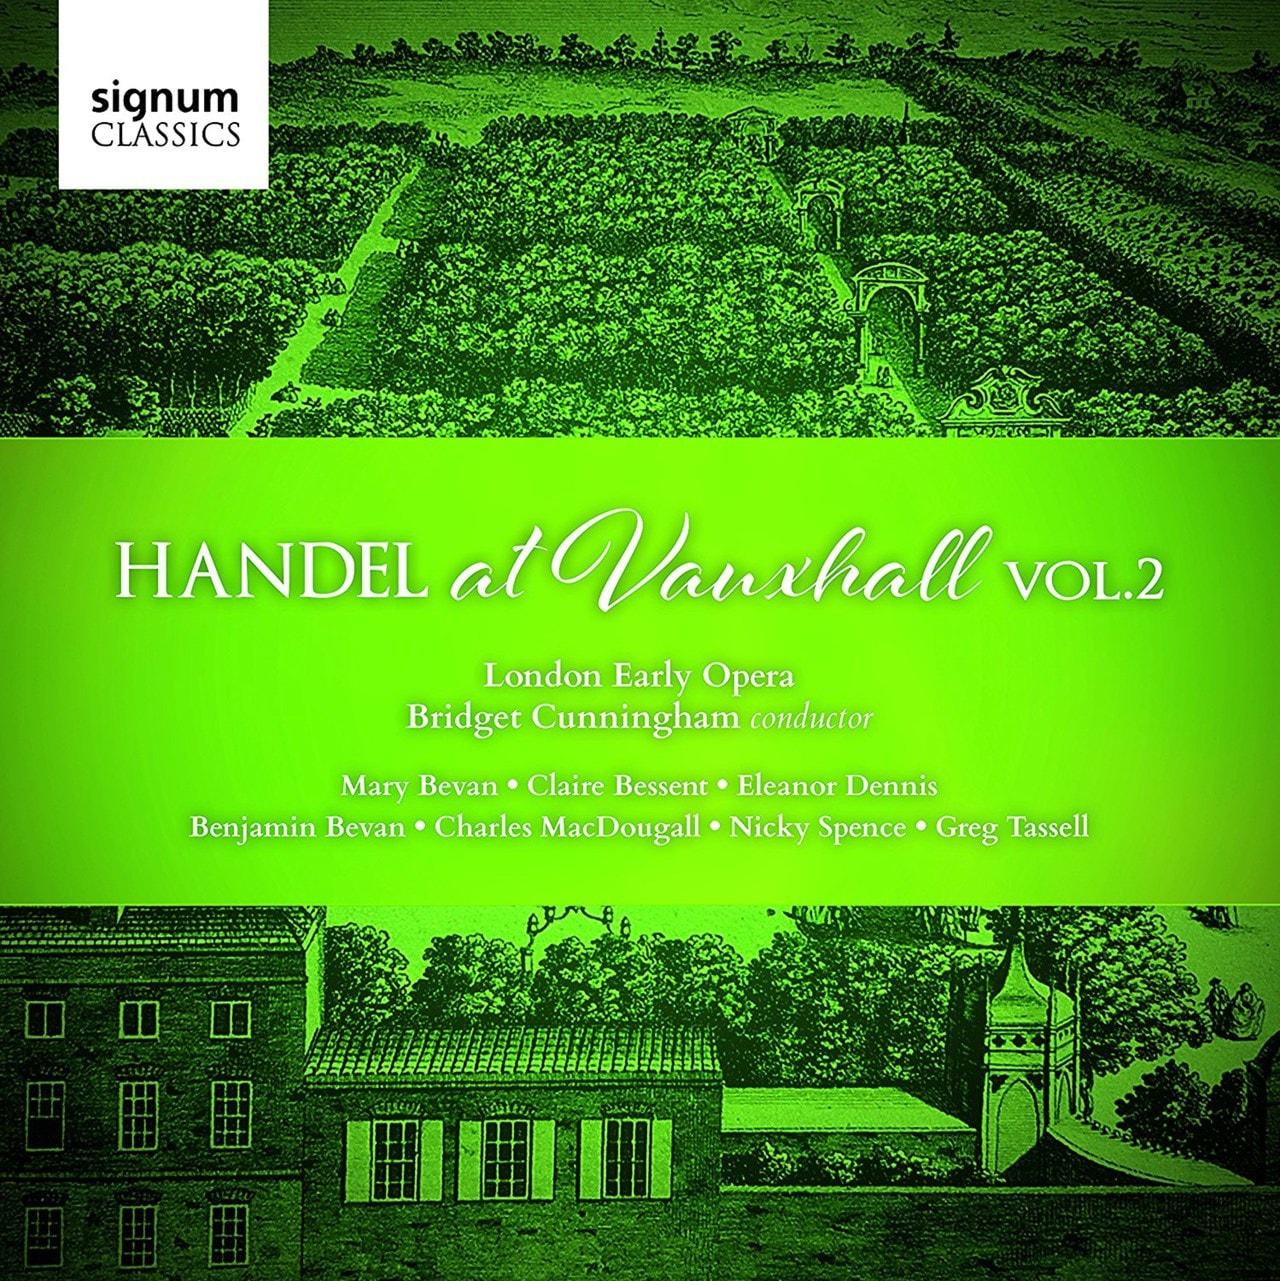 Handel at Vauxhall - Volume 2 - 1